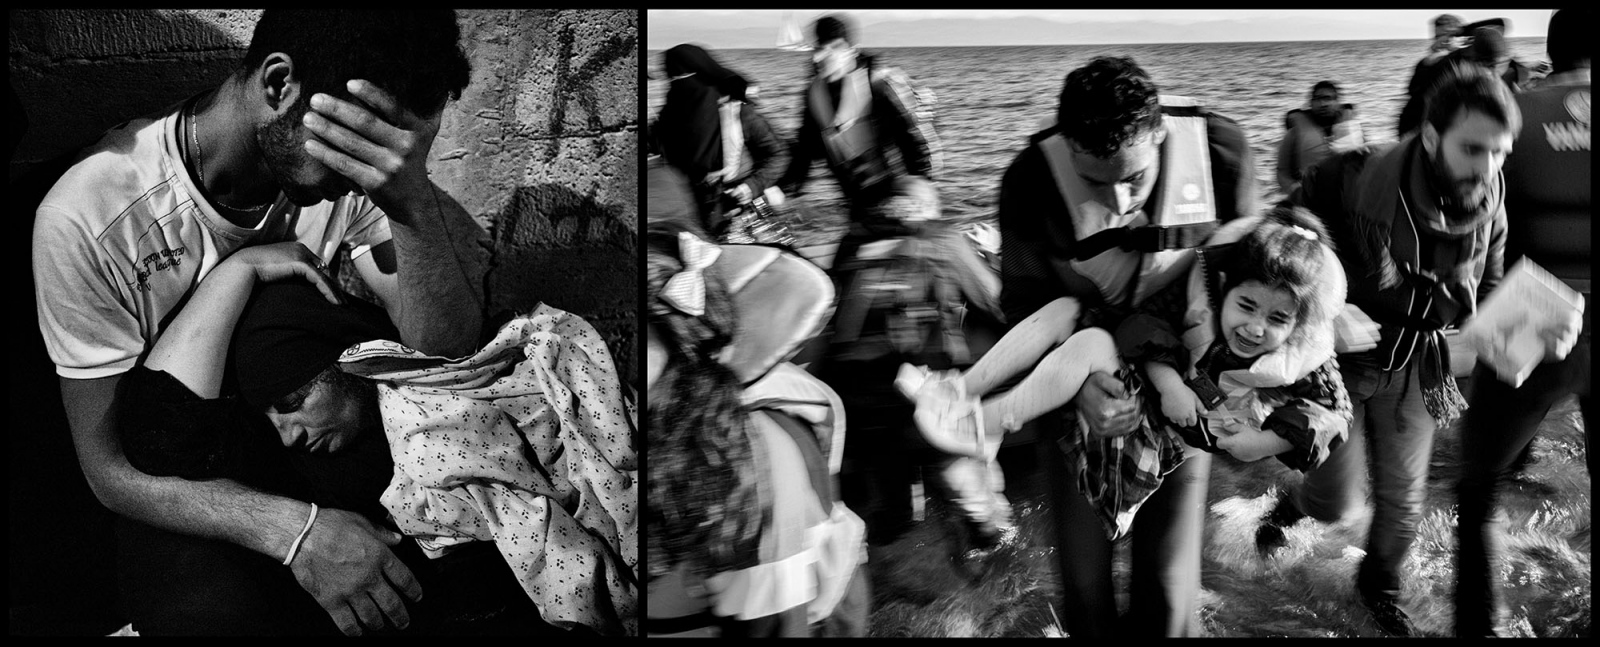 Art and Documentary Photography - Loading Nikos_Pilos_Stern_Goethe_institute_003.jpg